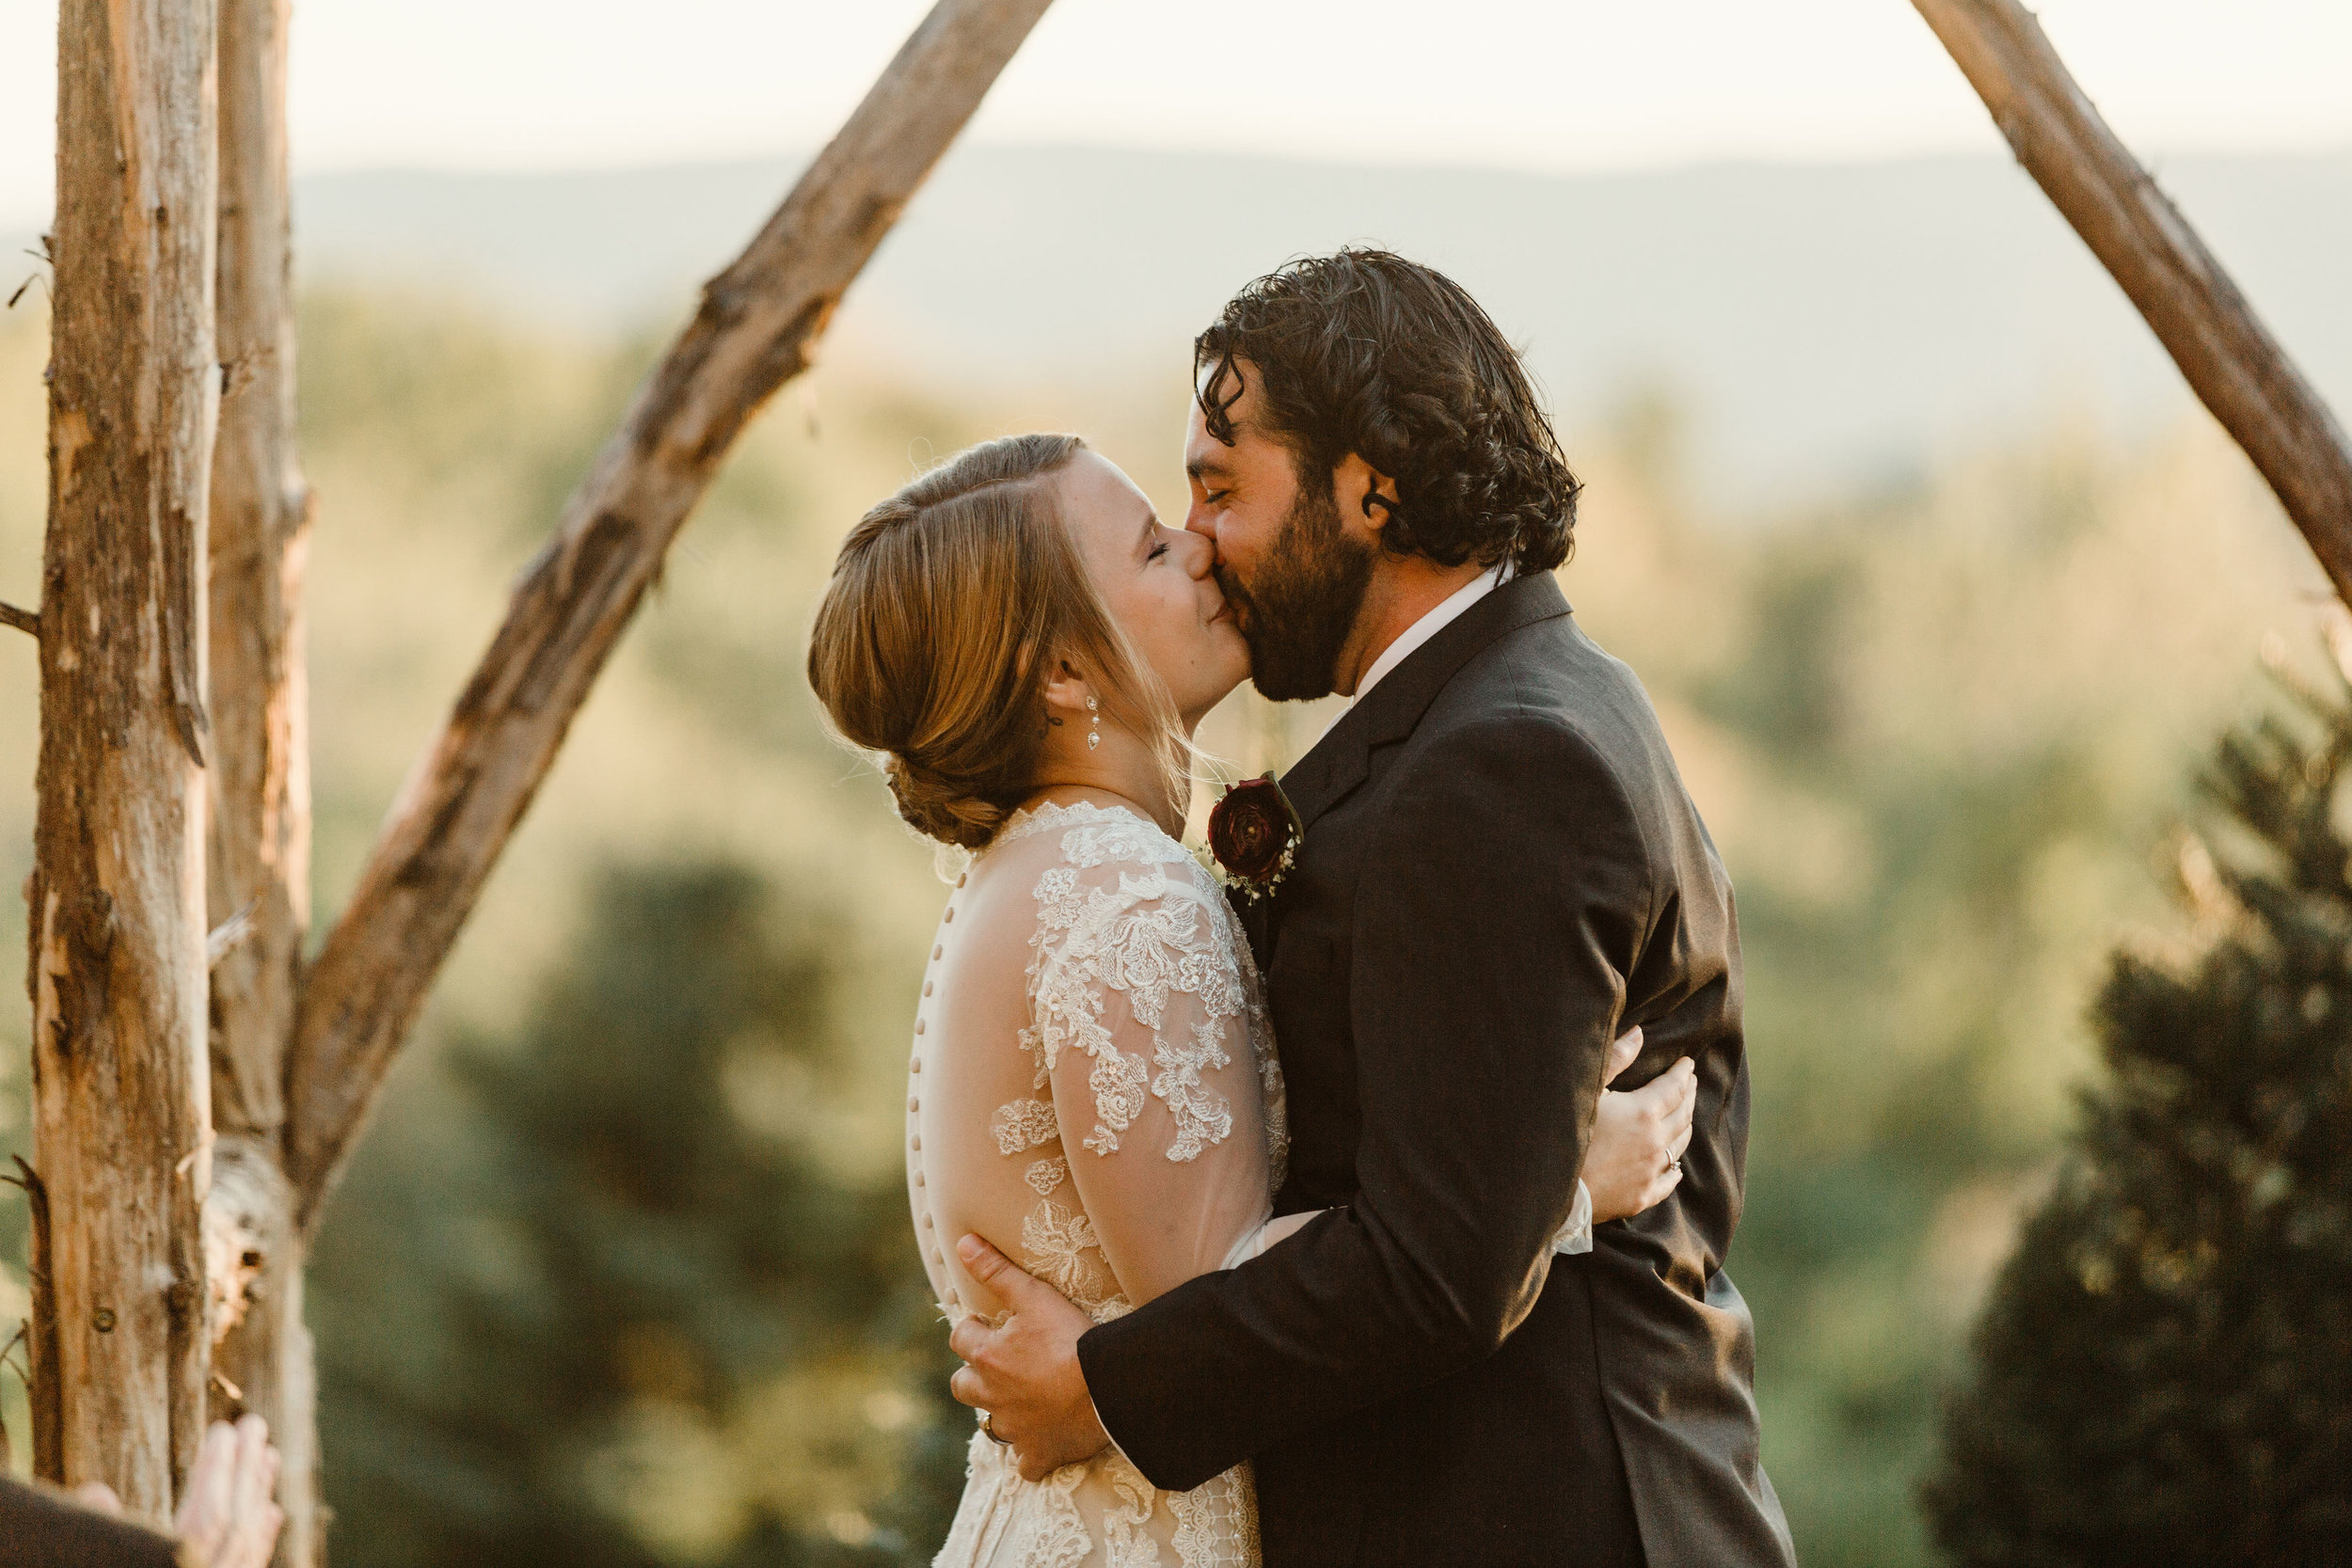 young-love-media-rustic-fall-autumn-wedding-emmerich-tree-farm-hudson-valley-warwick-new-york-ceremony-229.jpg